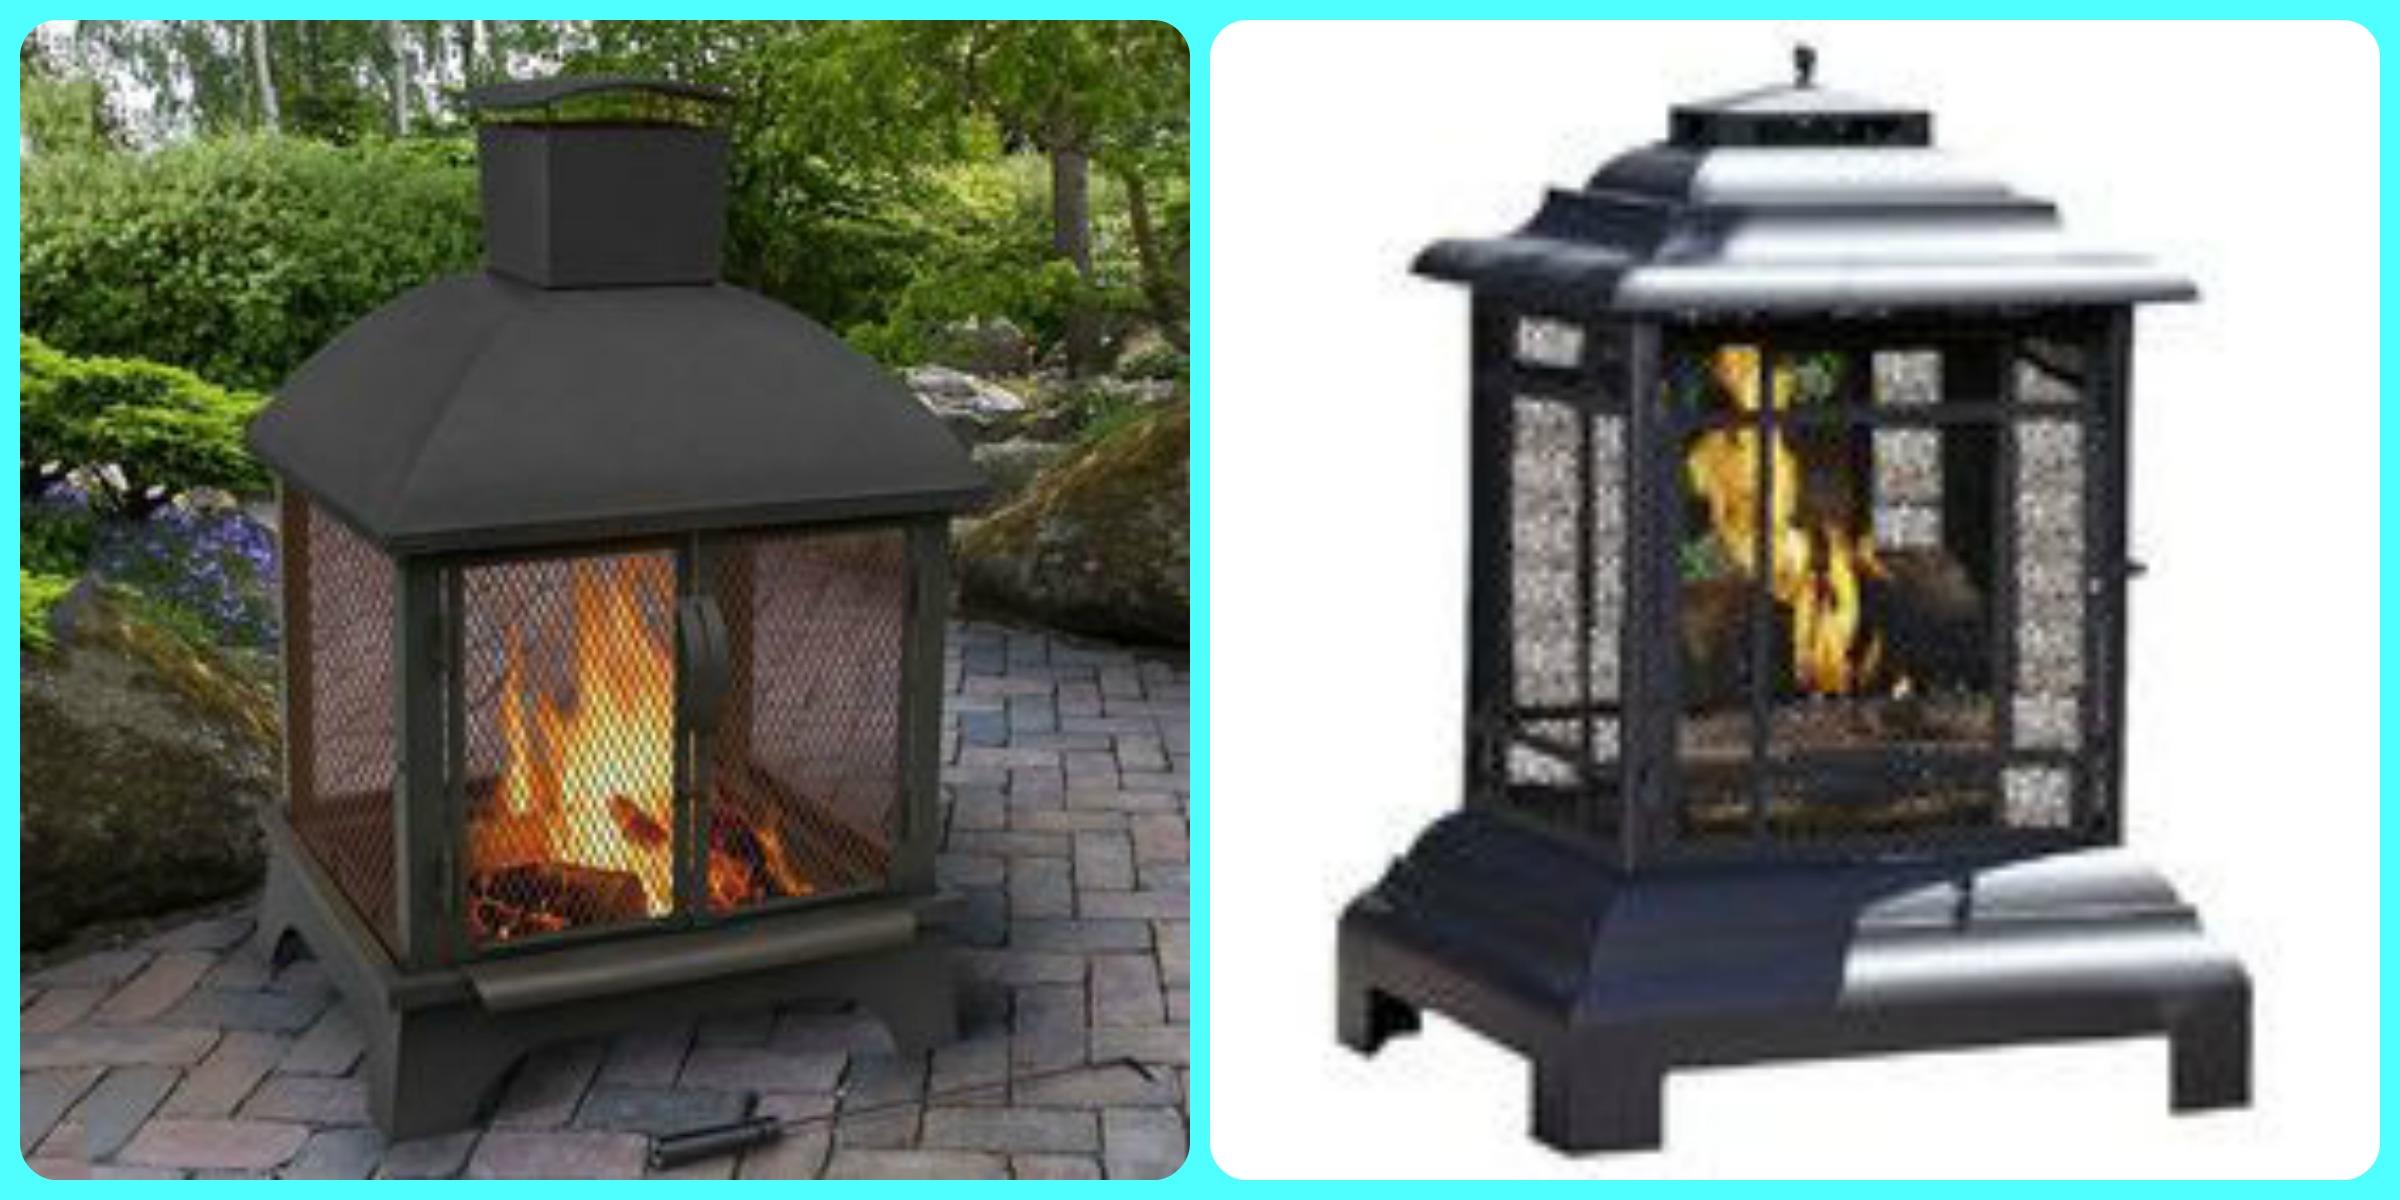 Backyard Fireplace Lowes : Outdoor Fireplace Lowes outdoor fireplace lowes natural stone fire